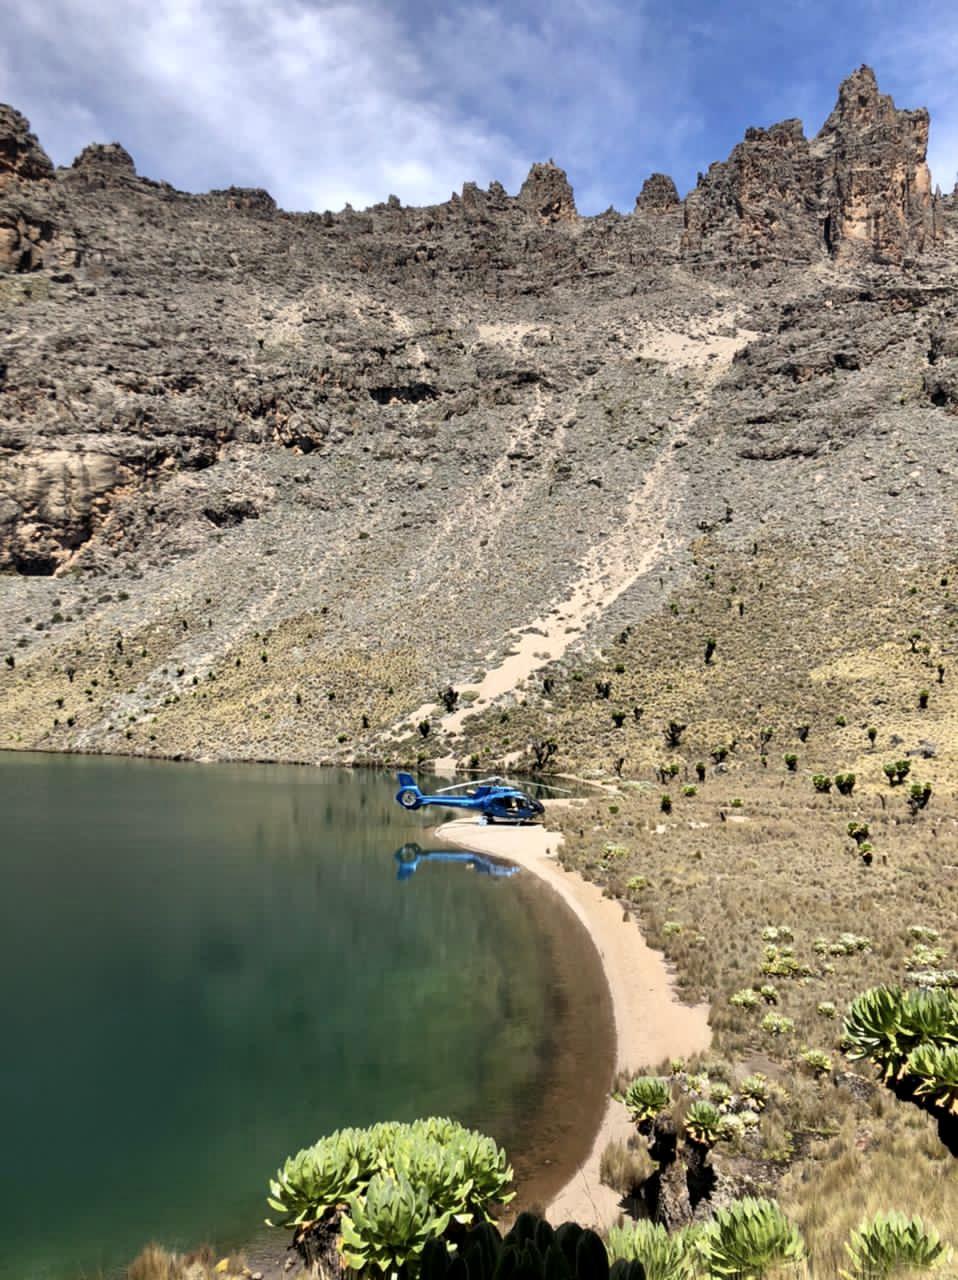 Helicopter at Enchanted Lake on Mount Kenya